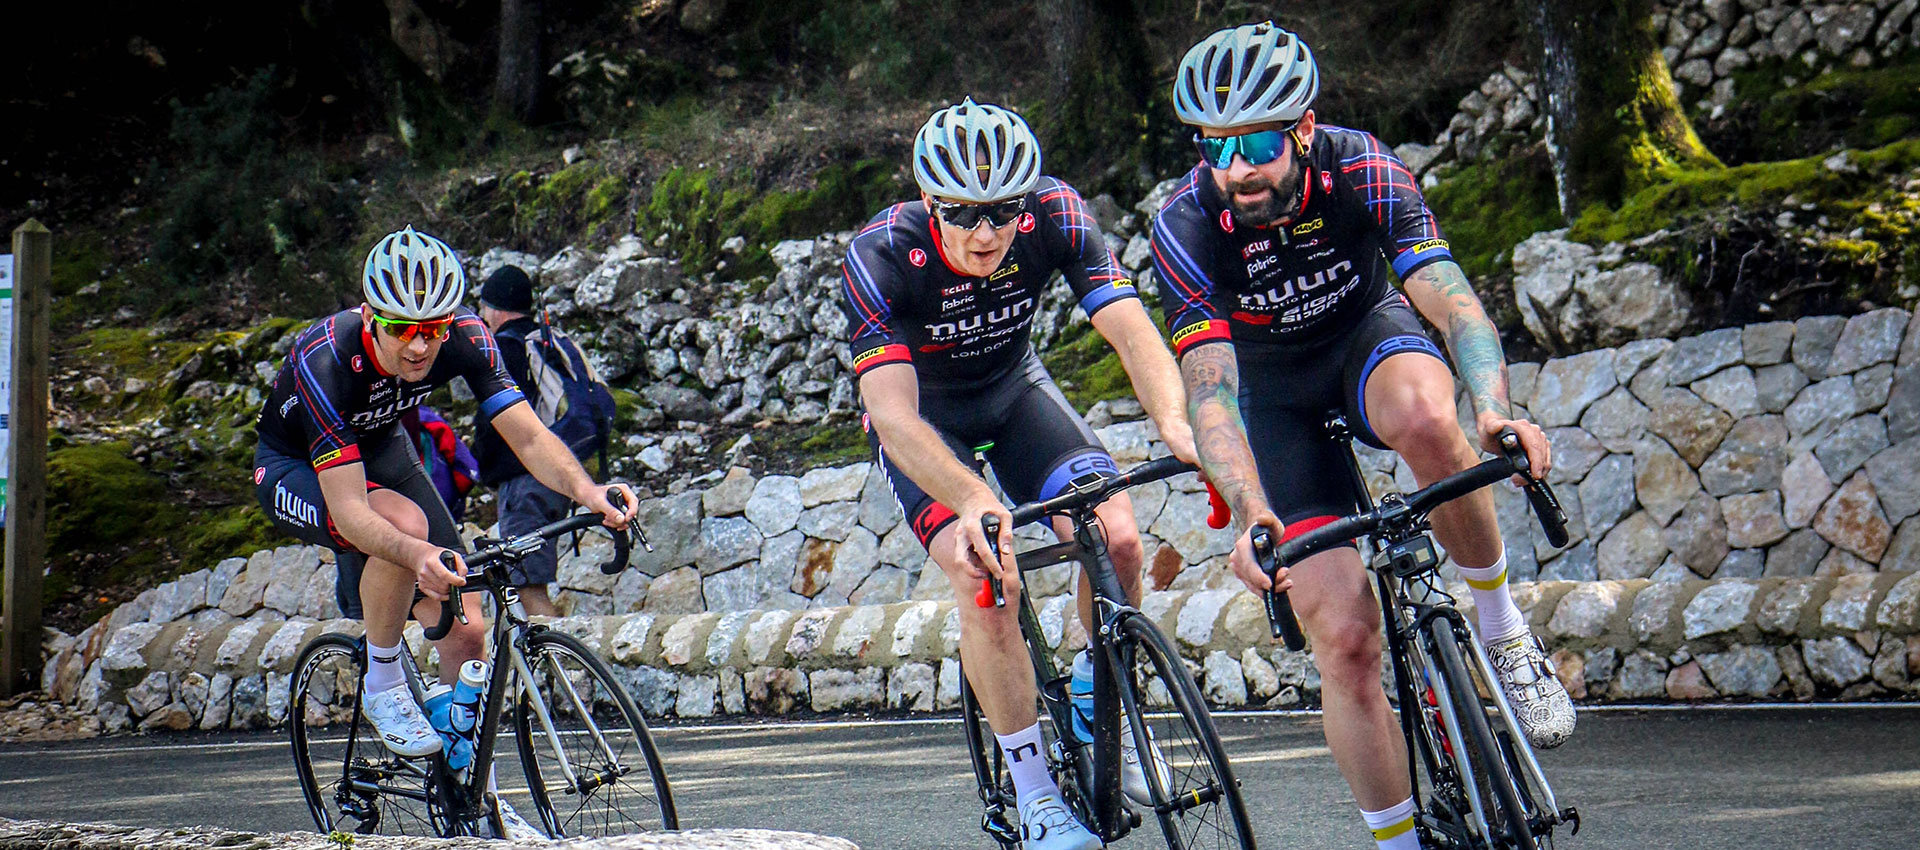 Nuun-Sigma Sports-London Race Team 2019 Riders and Sponsors b3290a105